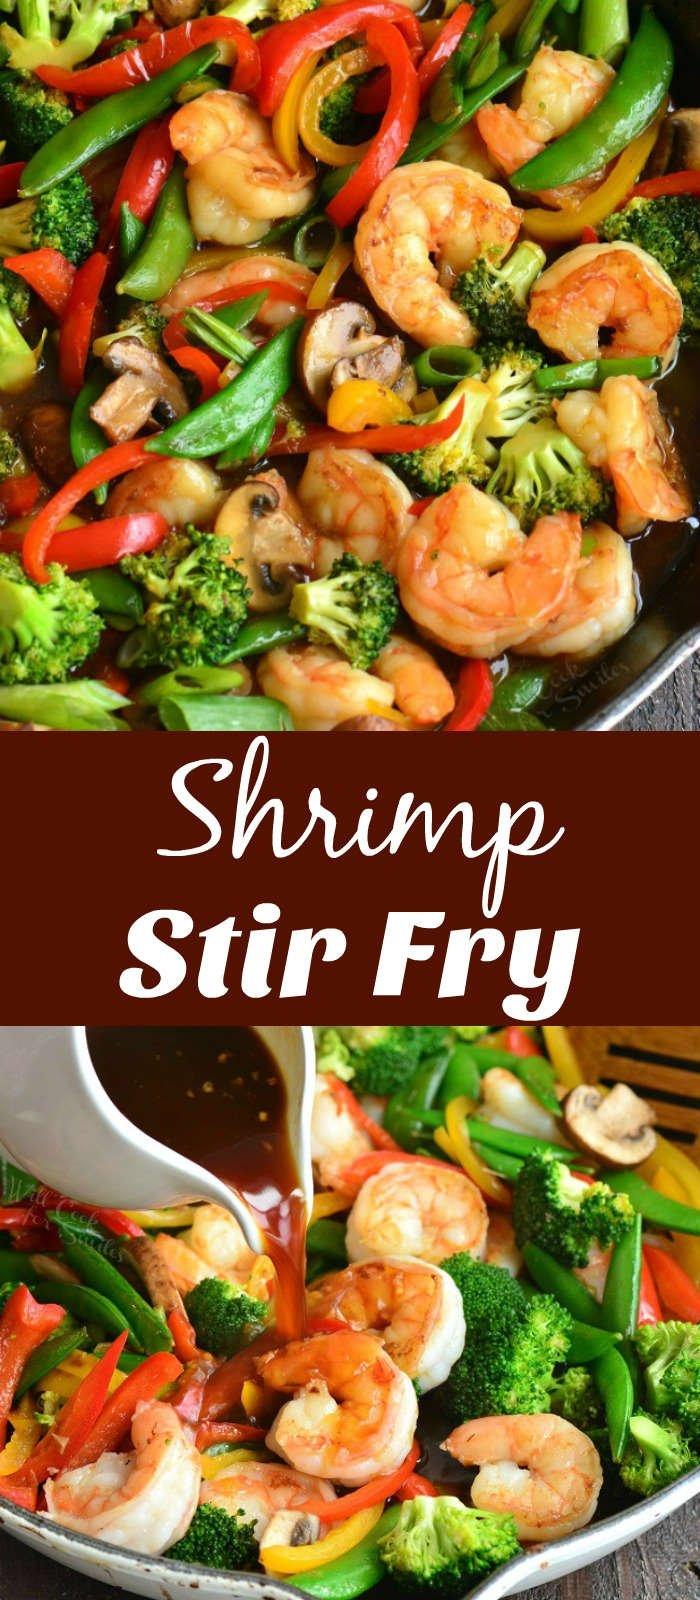 shrimp stir fry collage